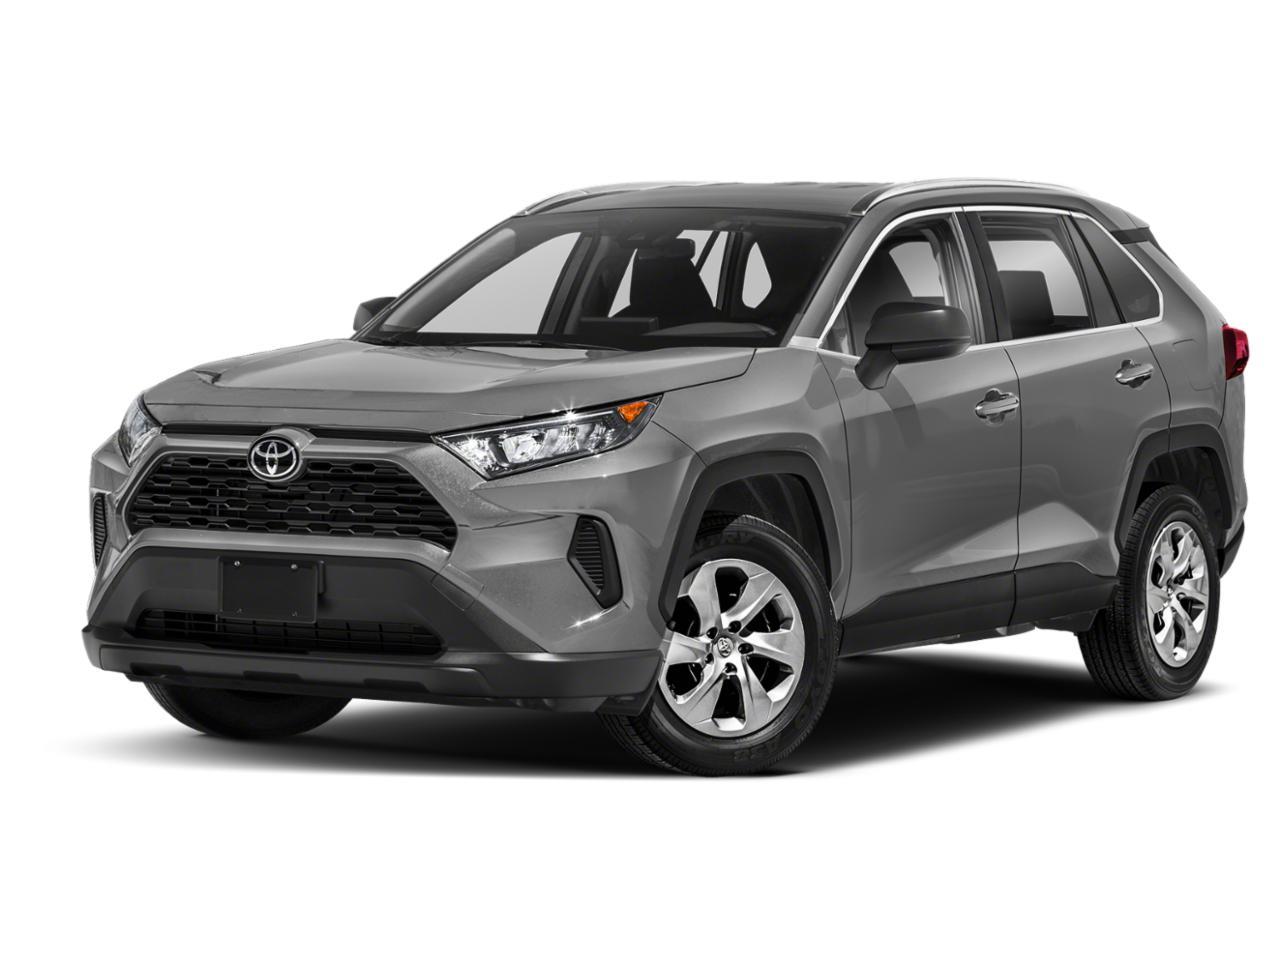 2020 Toyota RAV4 Vehicle Photo in San Antonio, TX 78238